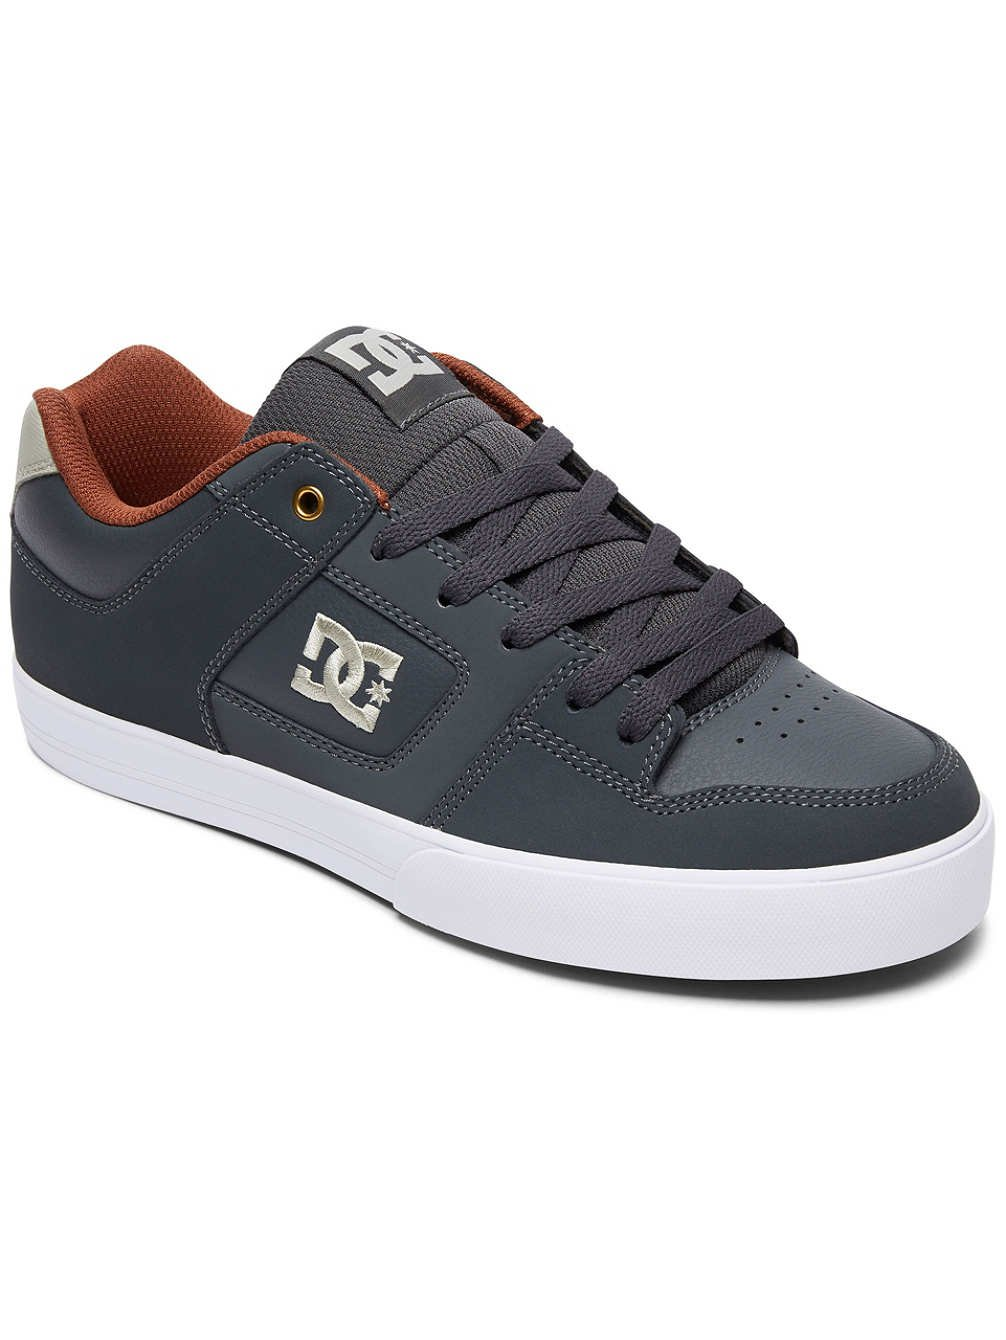 DC - Sneaker Pure 300660 - Black Athletic Red Bah 41 EU Gris